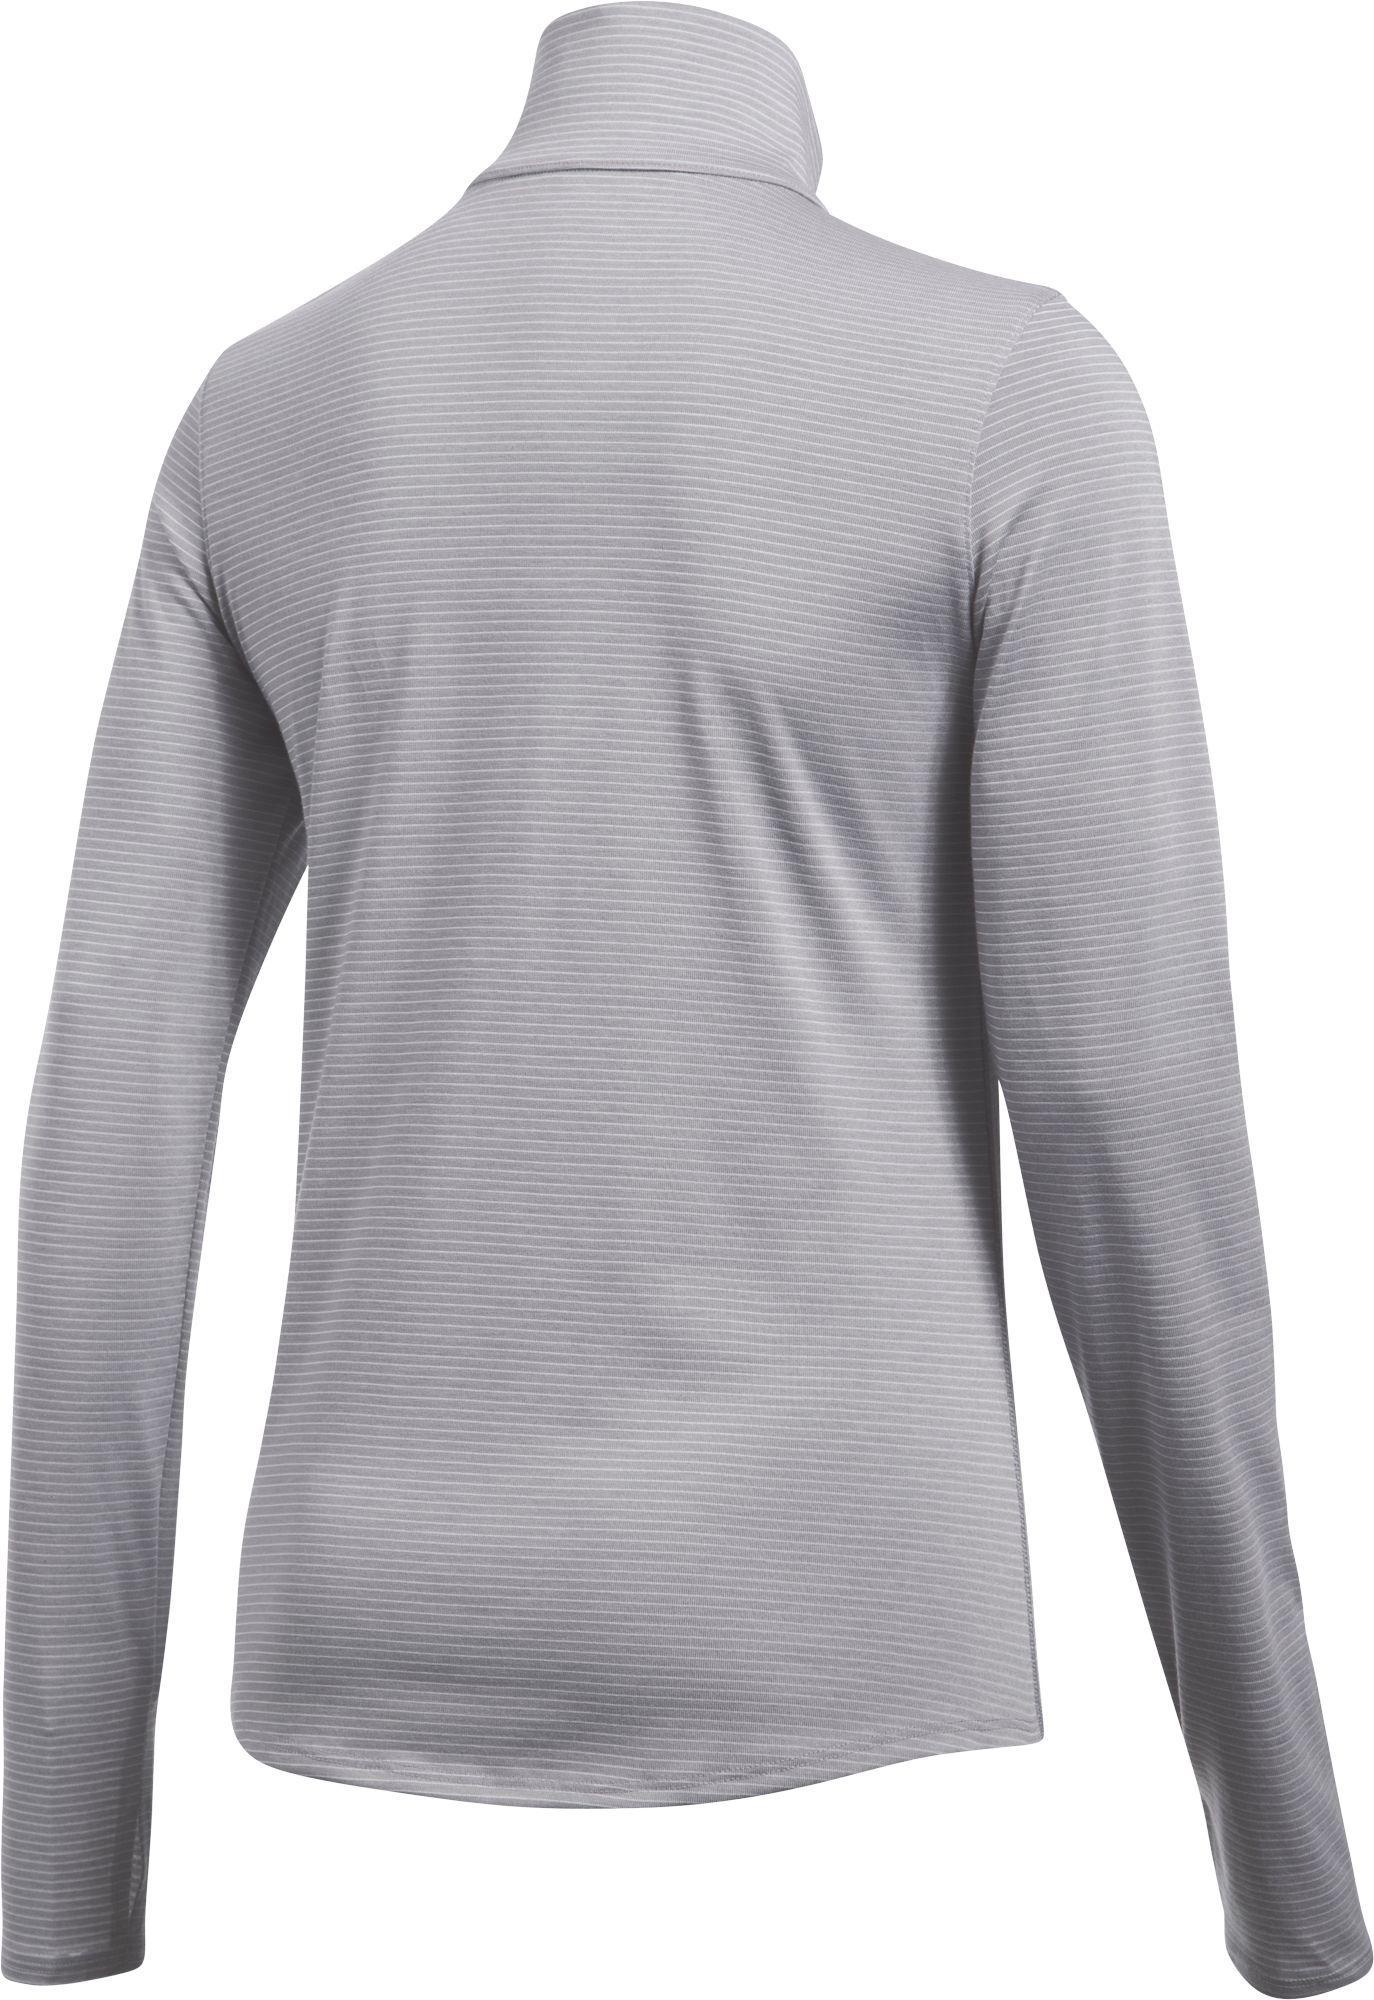 8aa3d25b Under Armour - Gray Threadborne Streaker Half-zip Long Sleeve Running Shirt  - Lyst